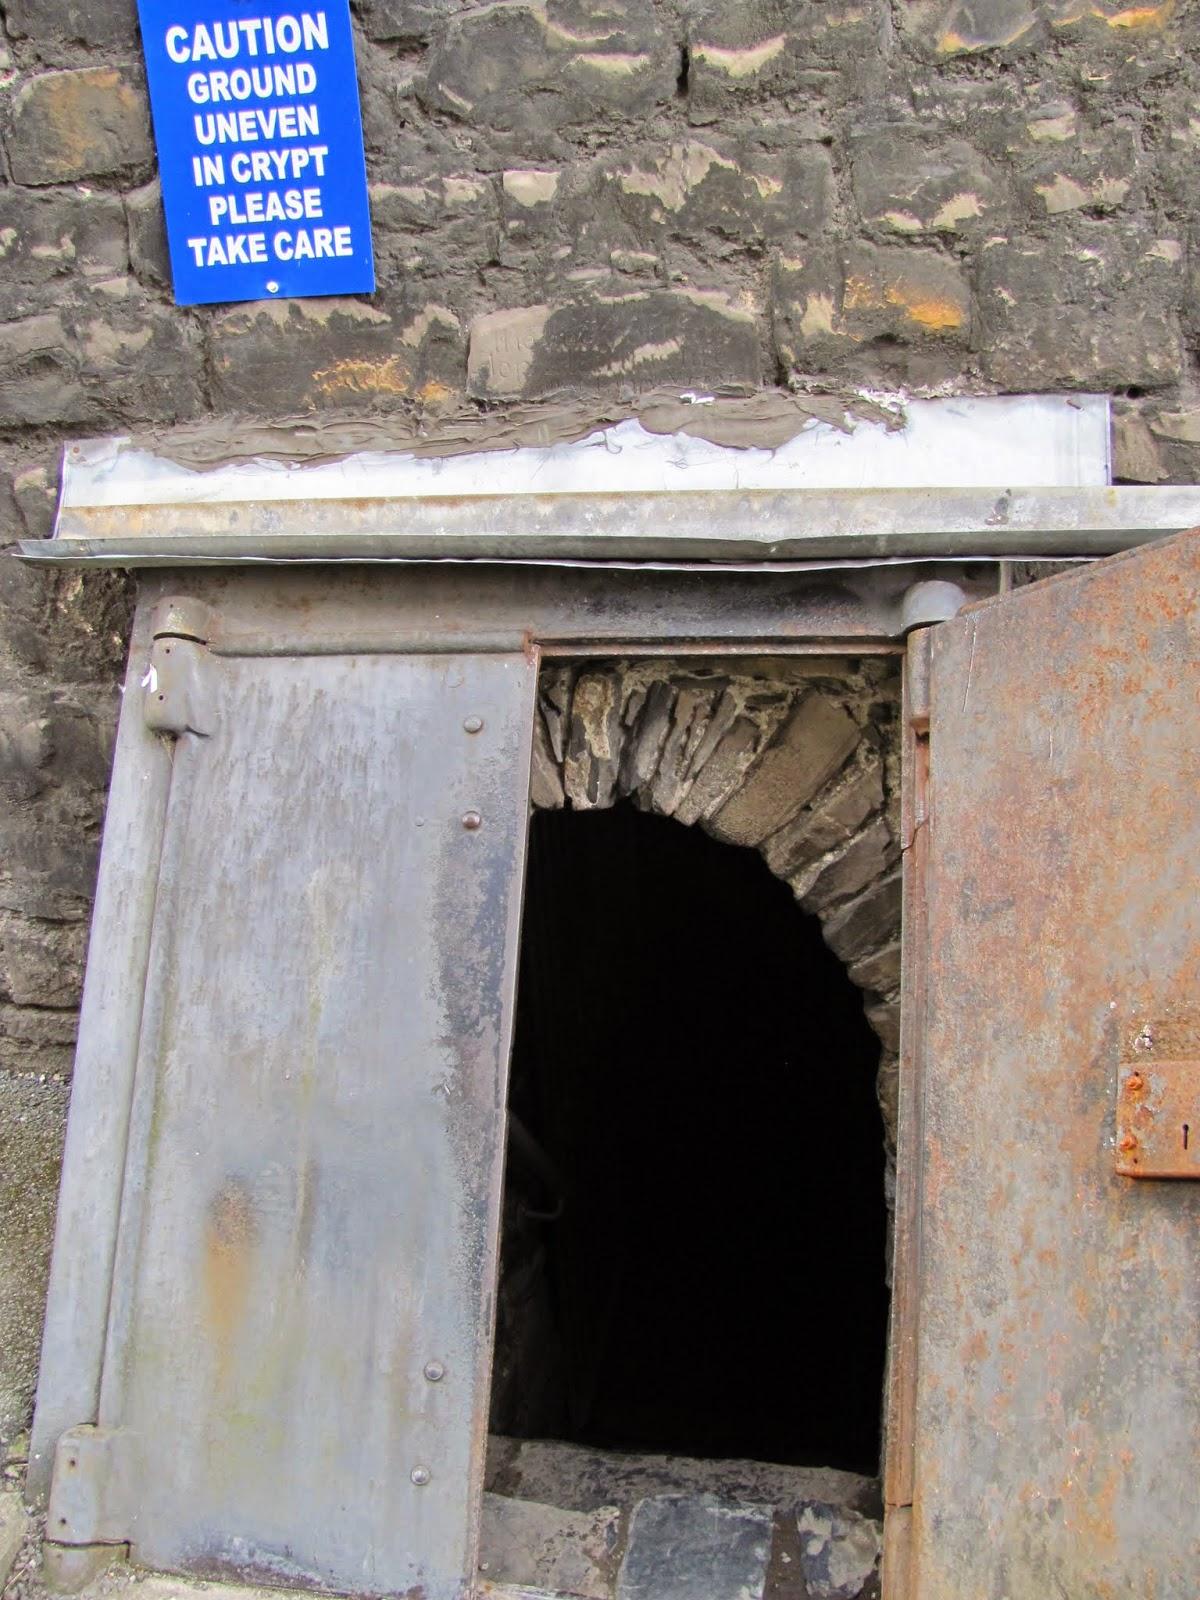 Entrance to the Crypt at St. Michan's Church Dublin, Ireland